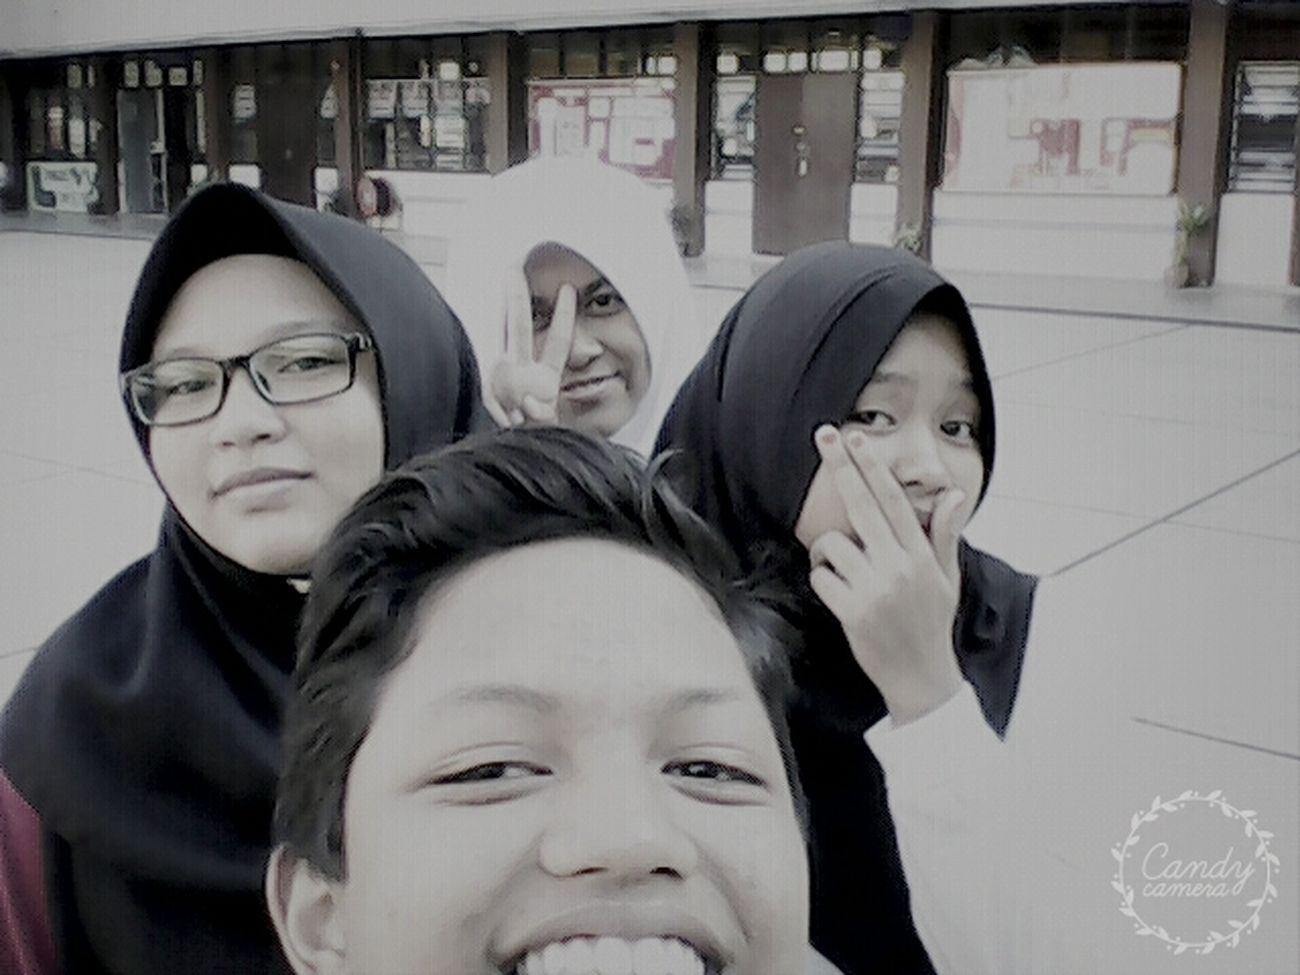 Me and friends hava a project at school.... tapi cikgu x dtg..